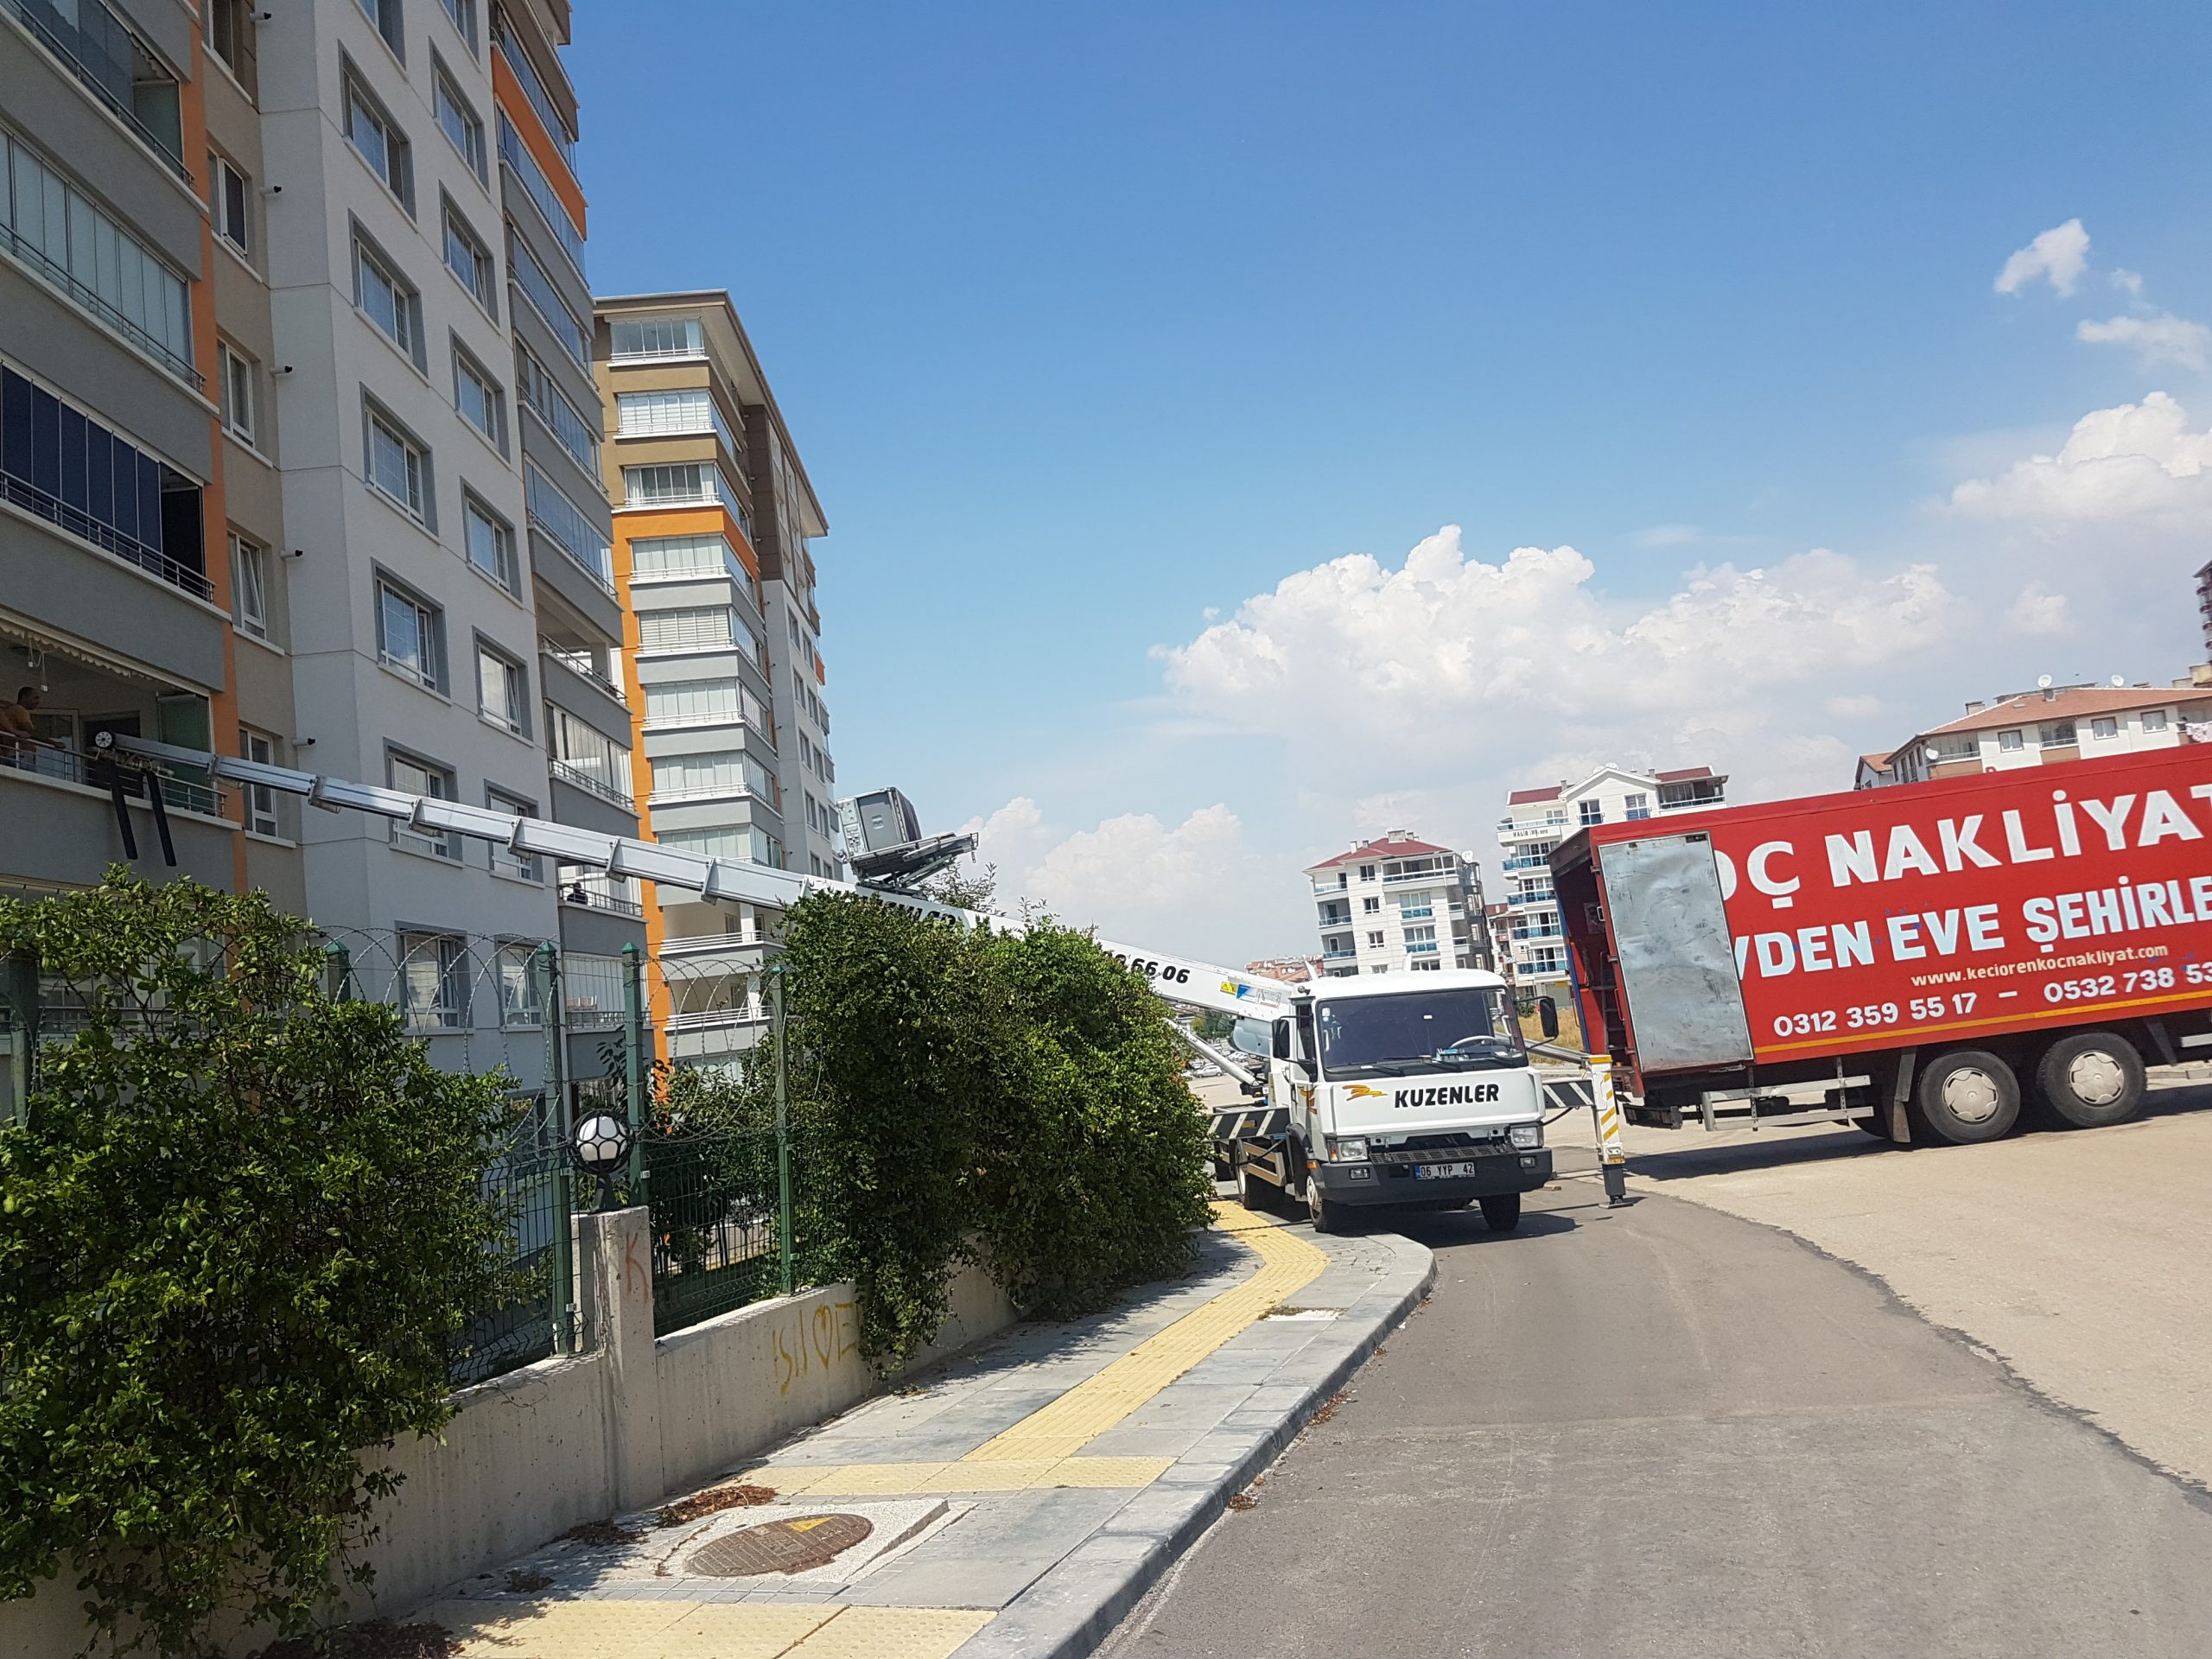 İstanbul Asansör Kiralama